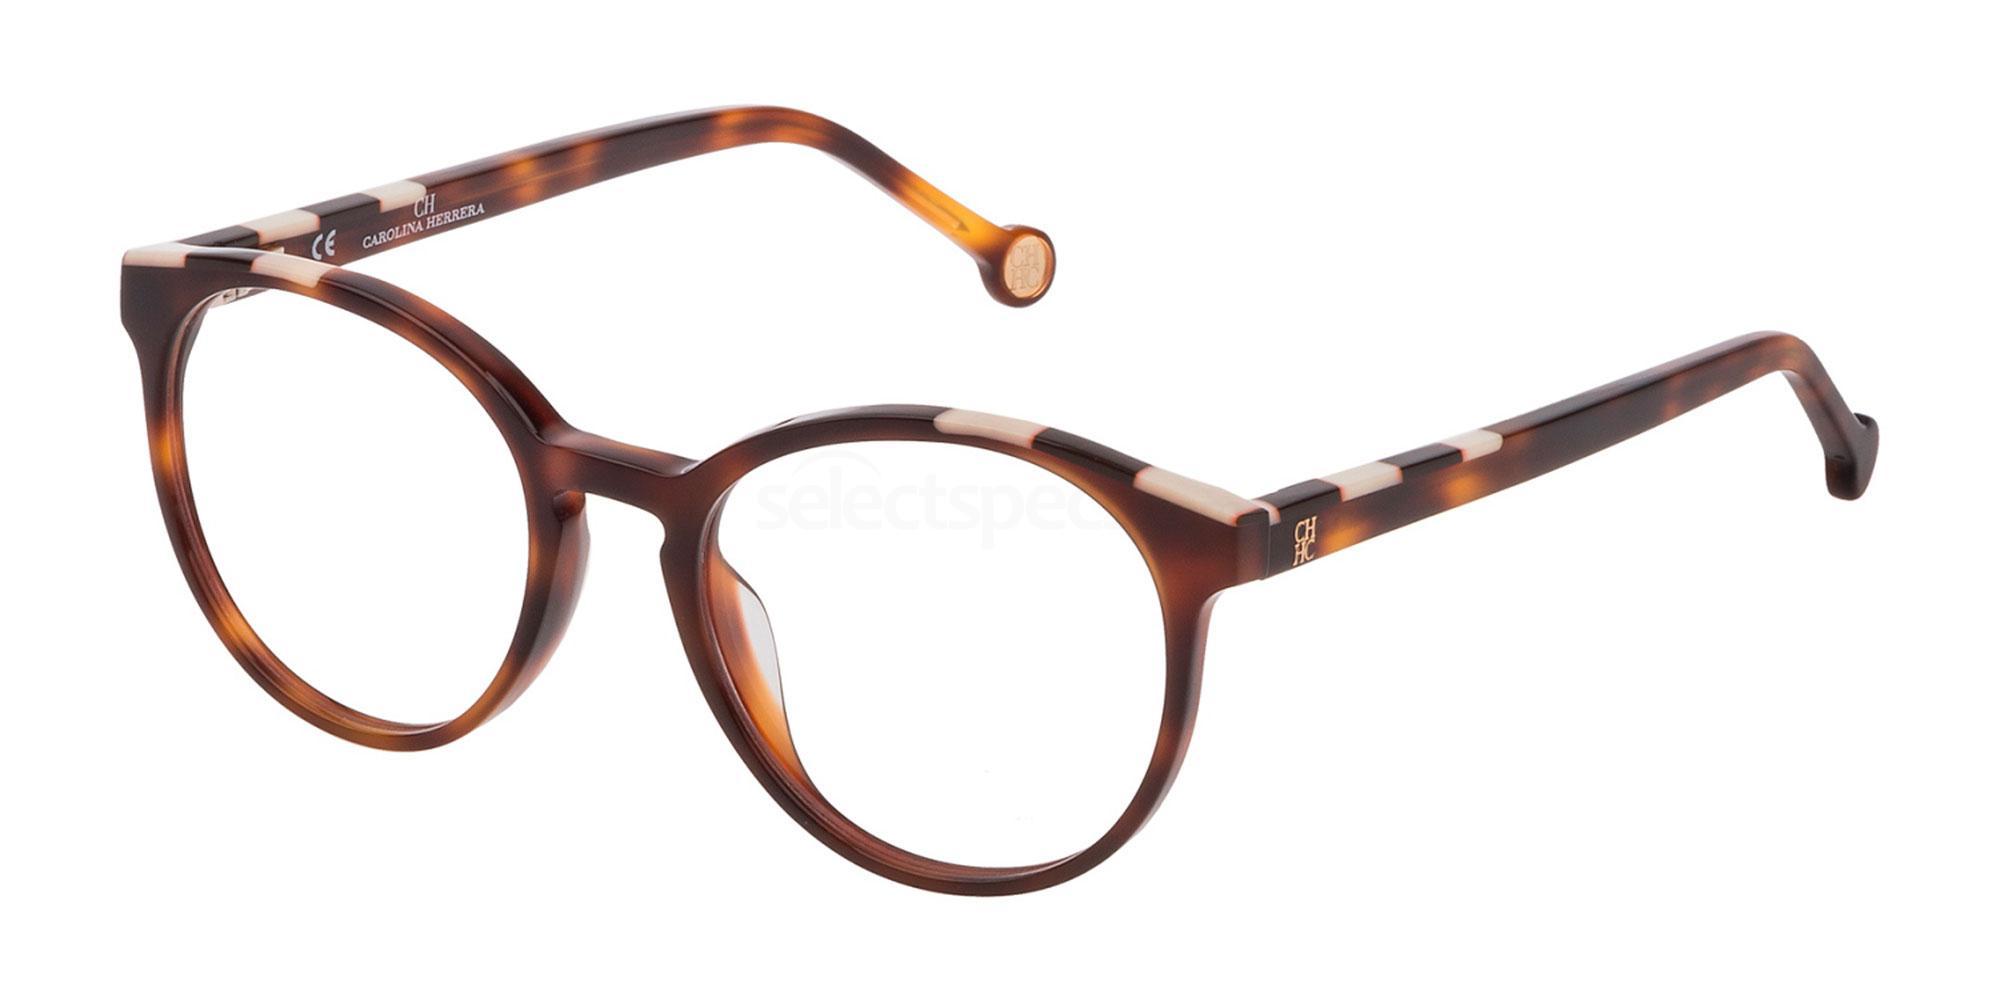 0752 VHE802 Glasses, CH Carolina Herrera